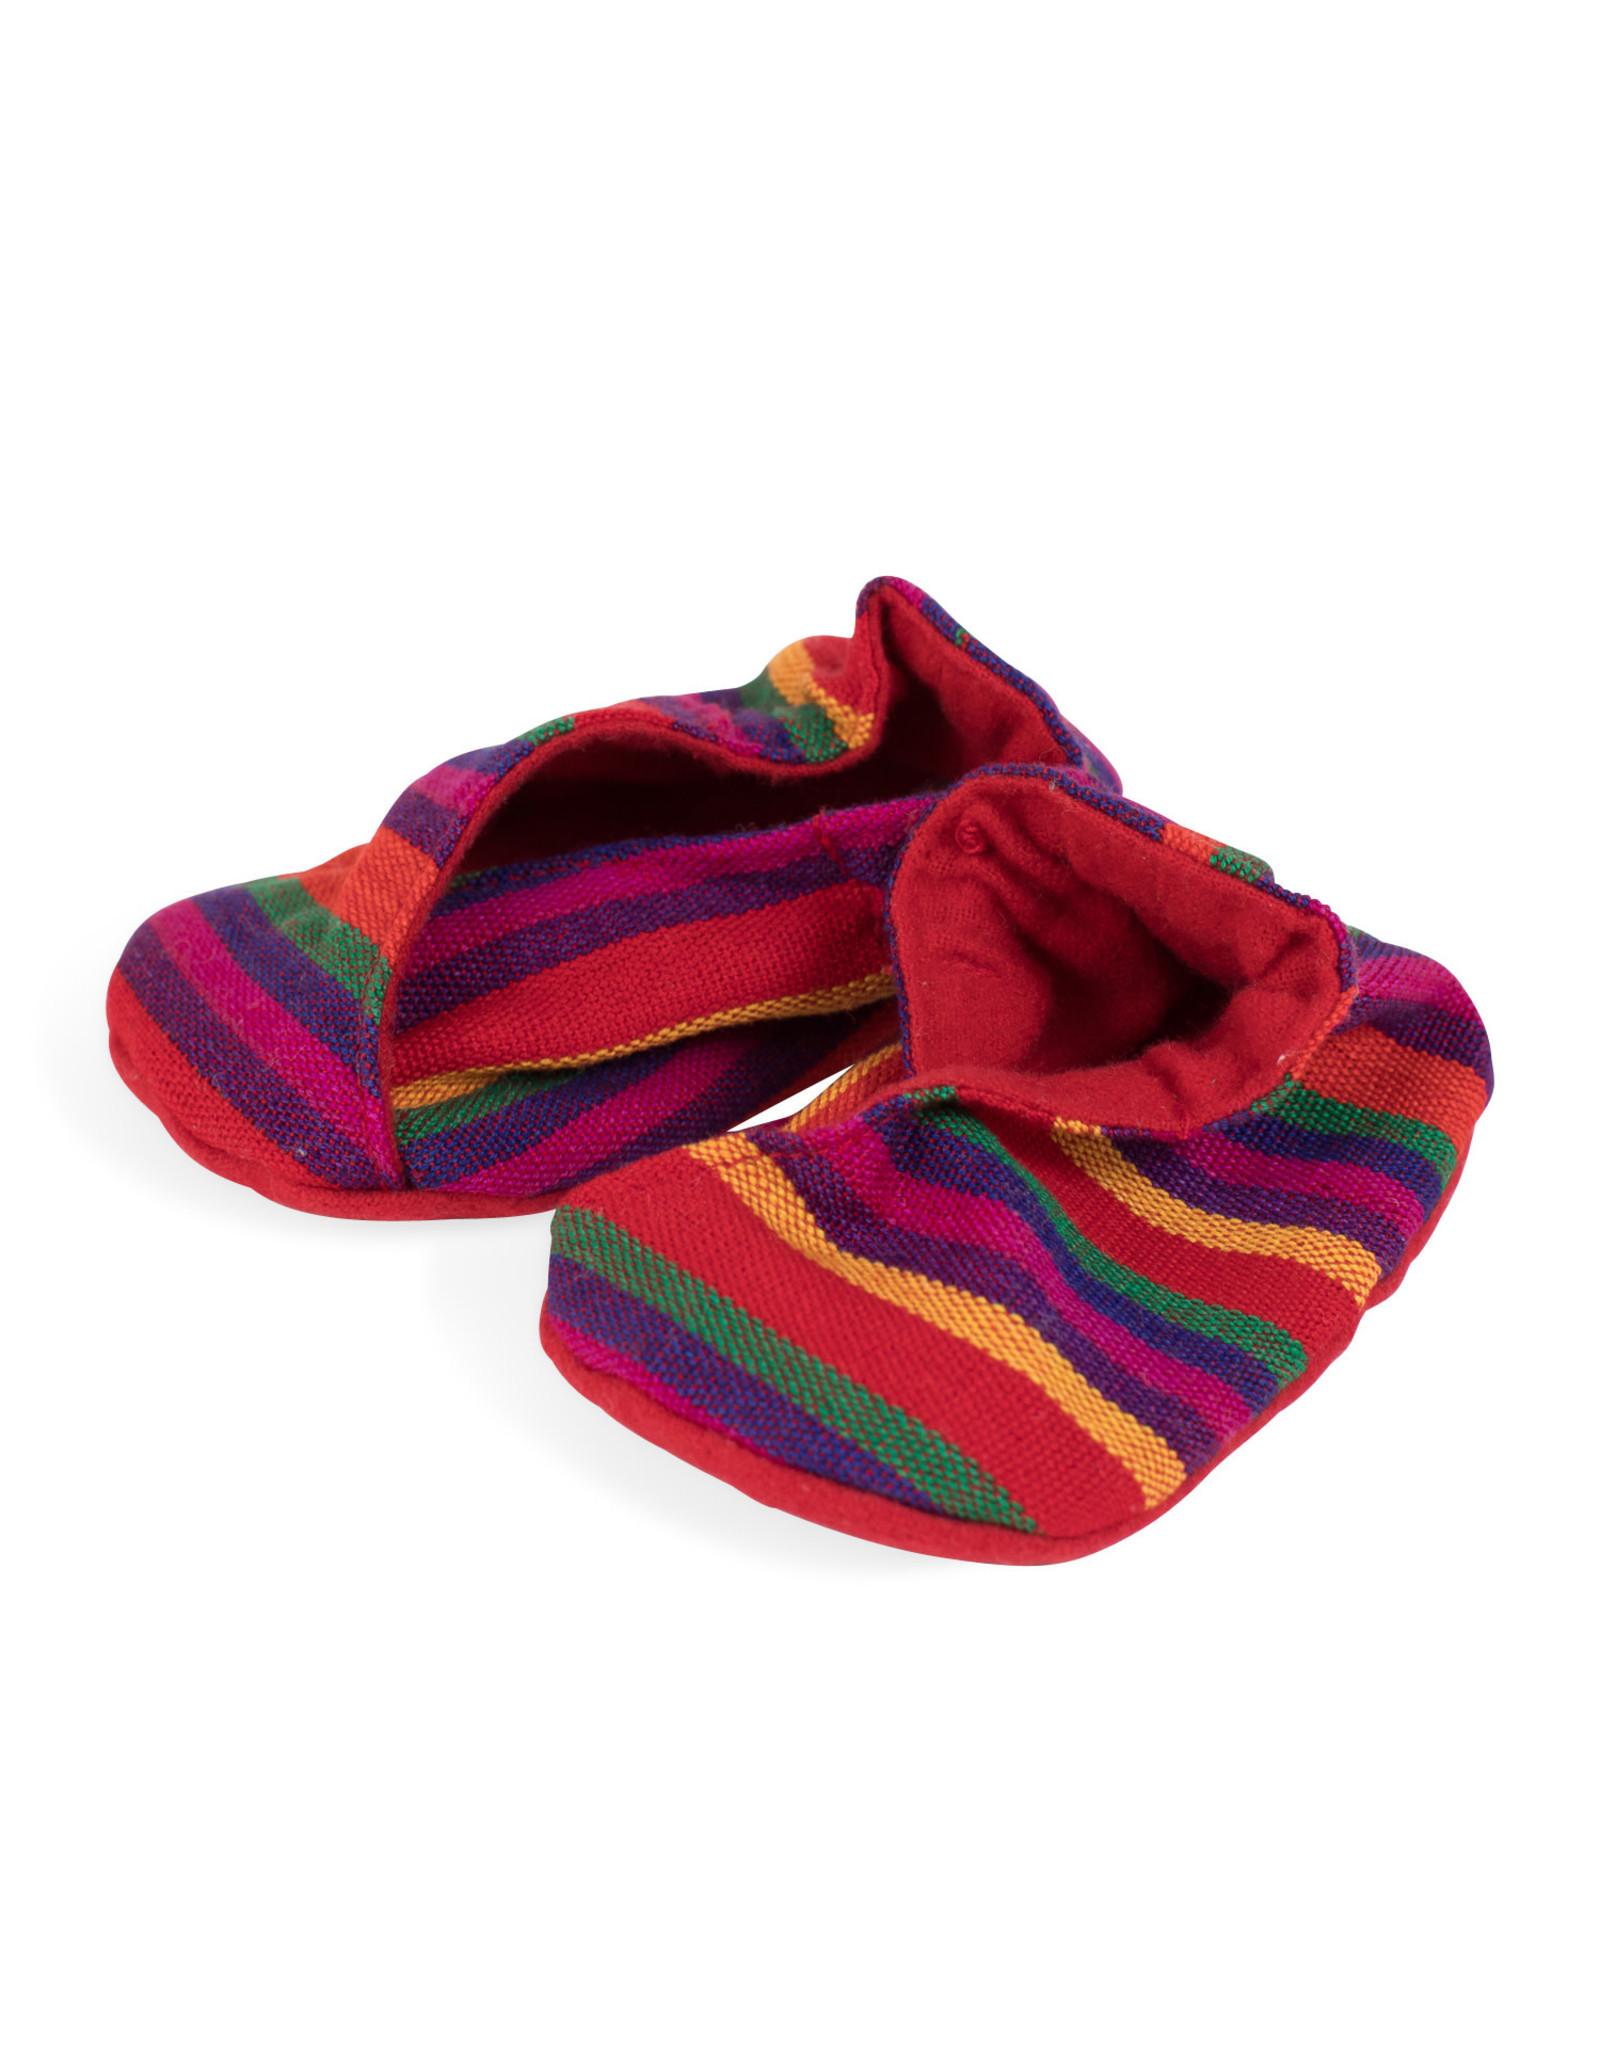 TTV USA Happy Feet Baby Booties, Guatemala